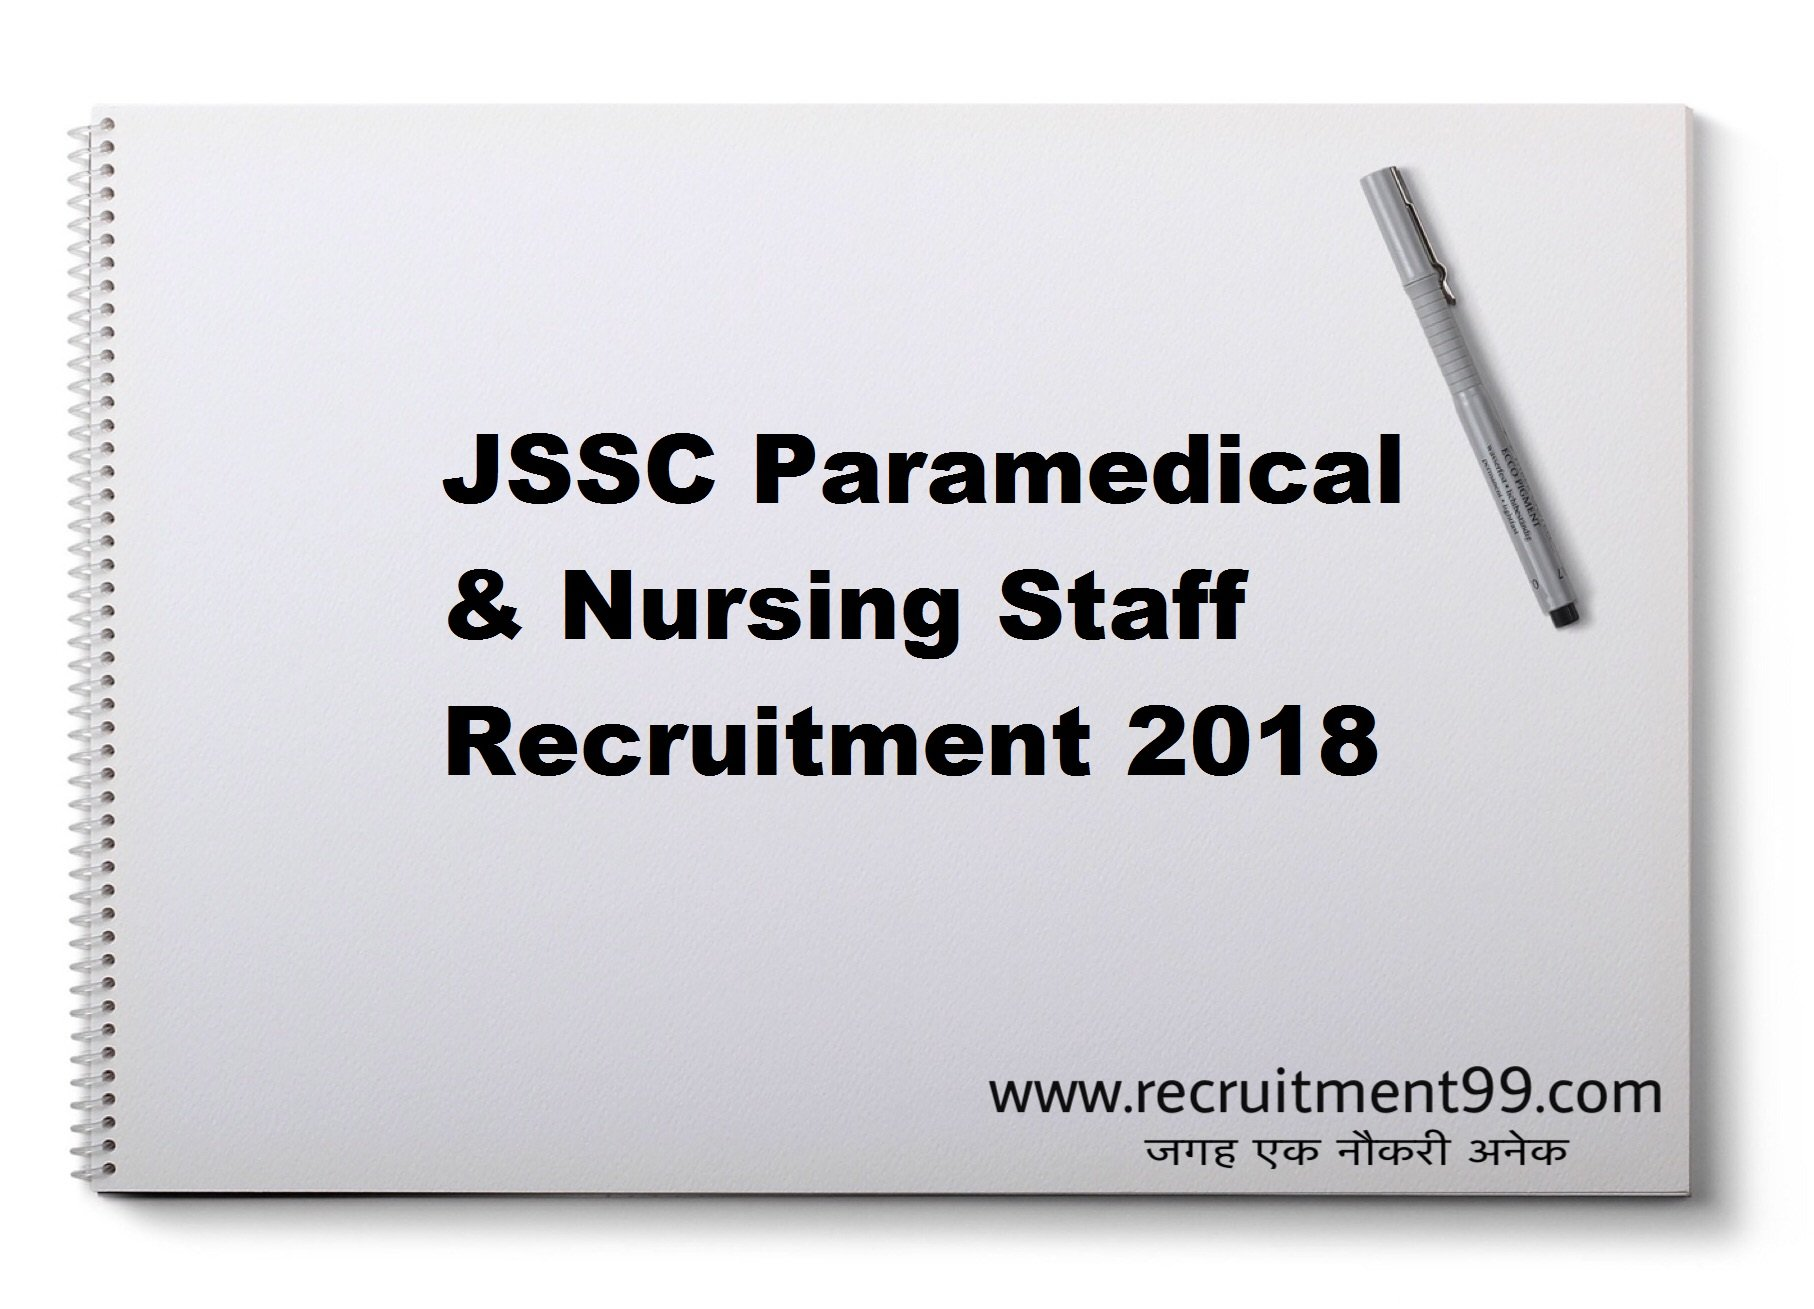 JSSC Paramedical & Nursing Staff Recruitment Admit Card Result 2018